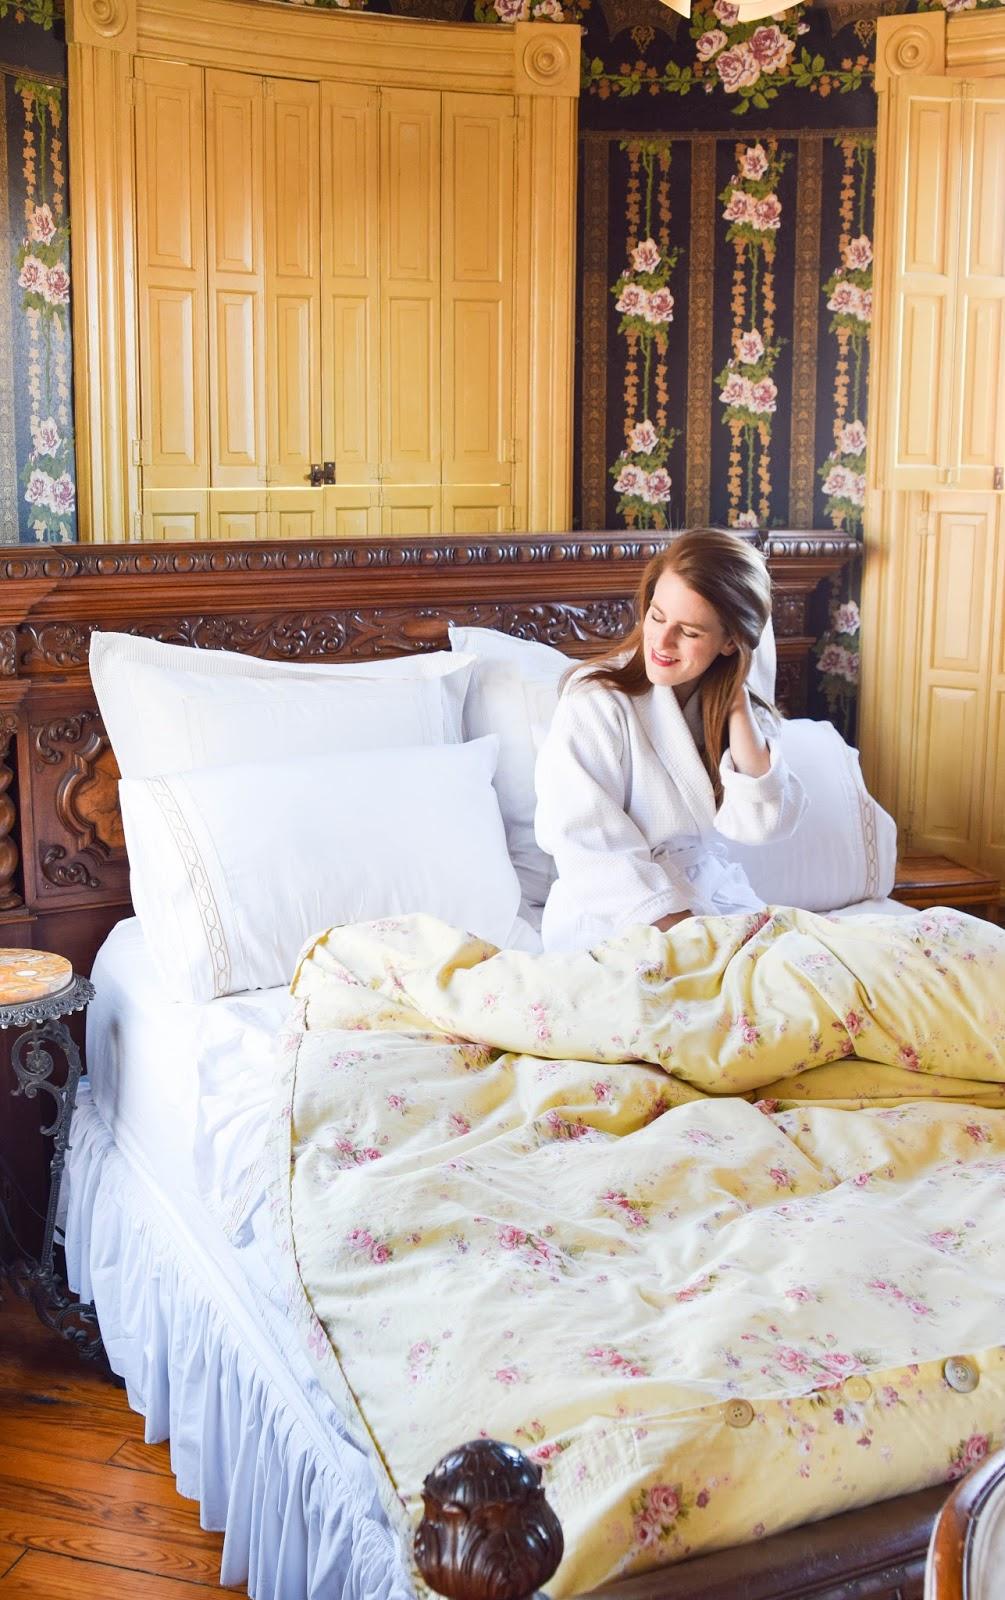 frederick maryland travel guide - visit frederick - frederick maryland bed and breakfast - romantic frederick maryland